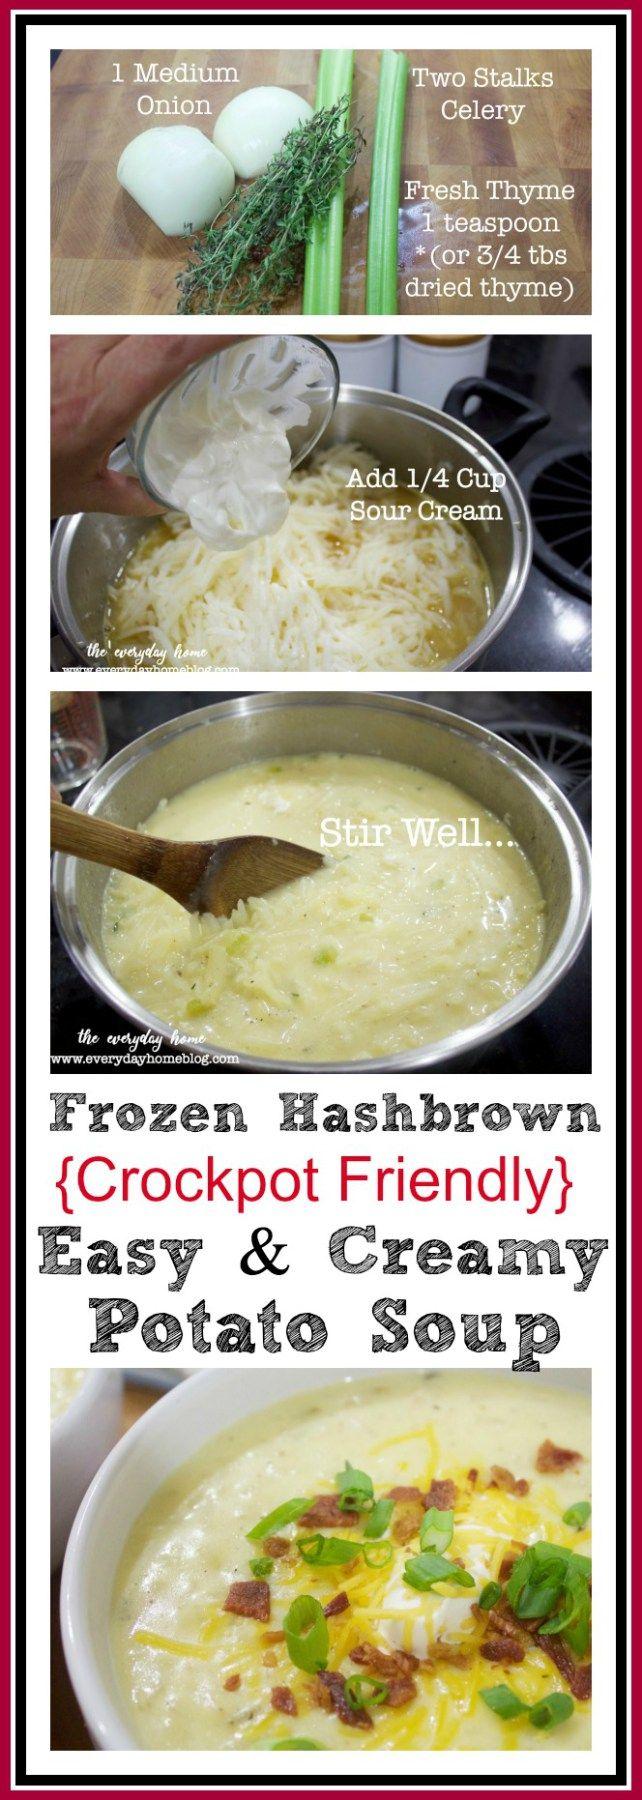 Frozen Hashbrowns Potato Soup | The Everyday Home | www.everydayhomeblog.com #crockpotrecipe